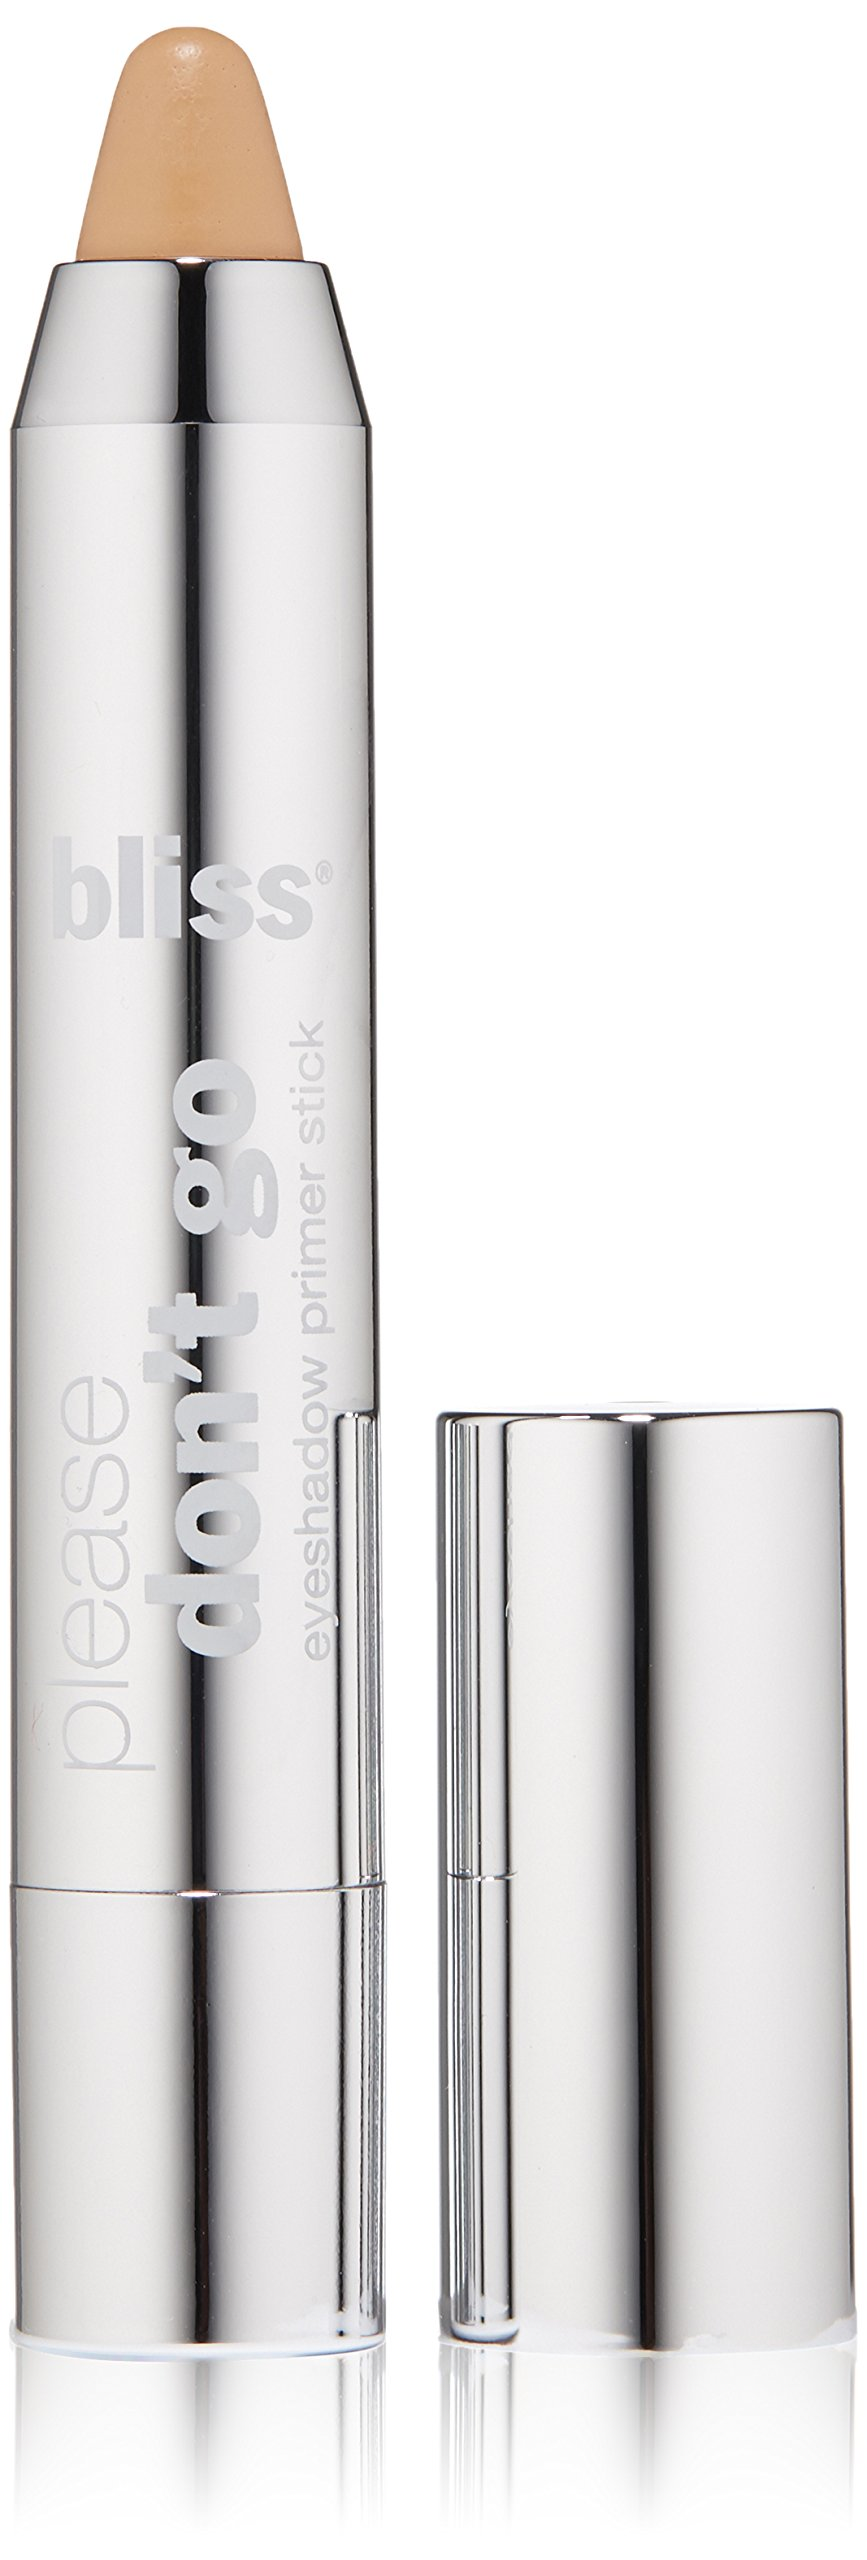 bliss Please Don't Go Eyeshadow Primer, 0.1 oz.